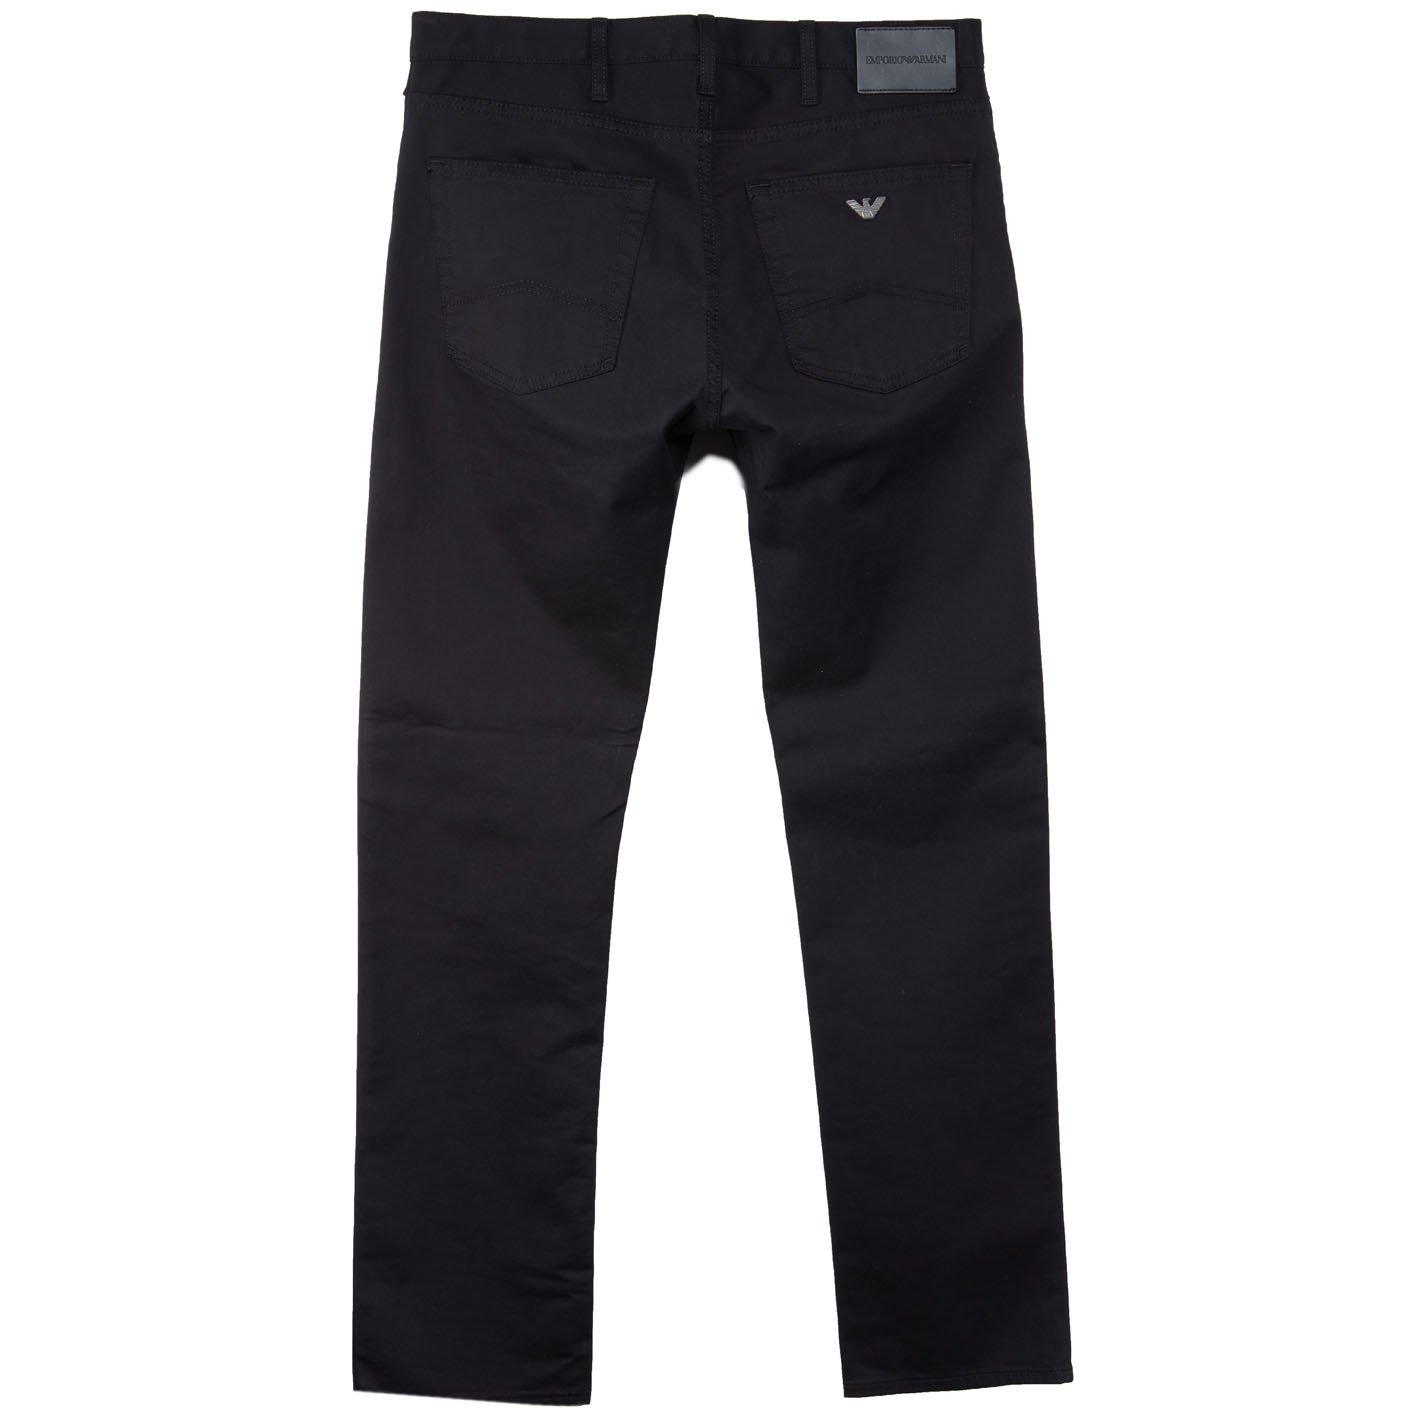 Emporio Armani Hombres J45 slim fit jeans Negro 46 Regular ...